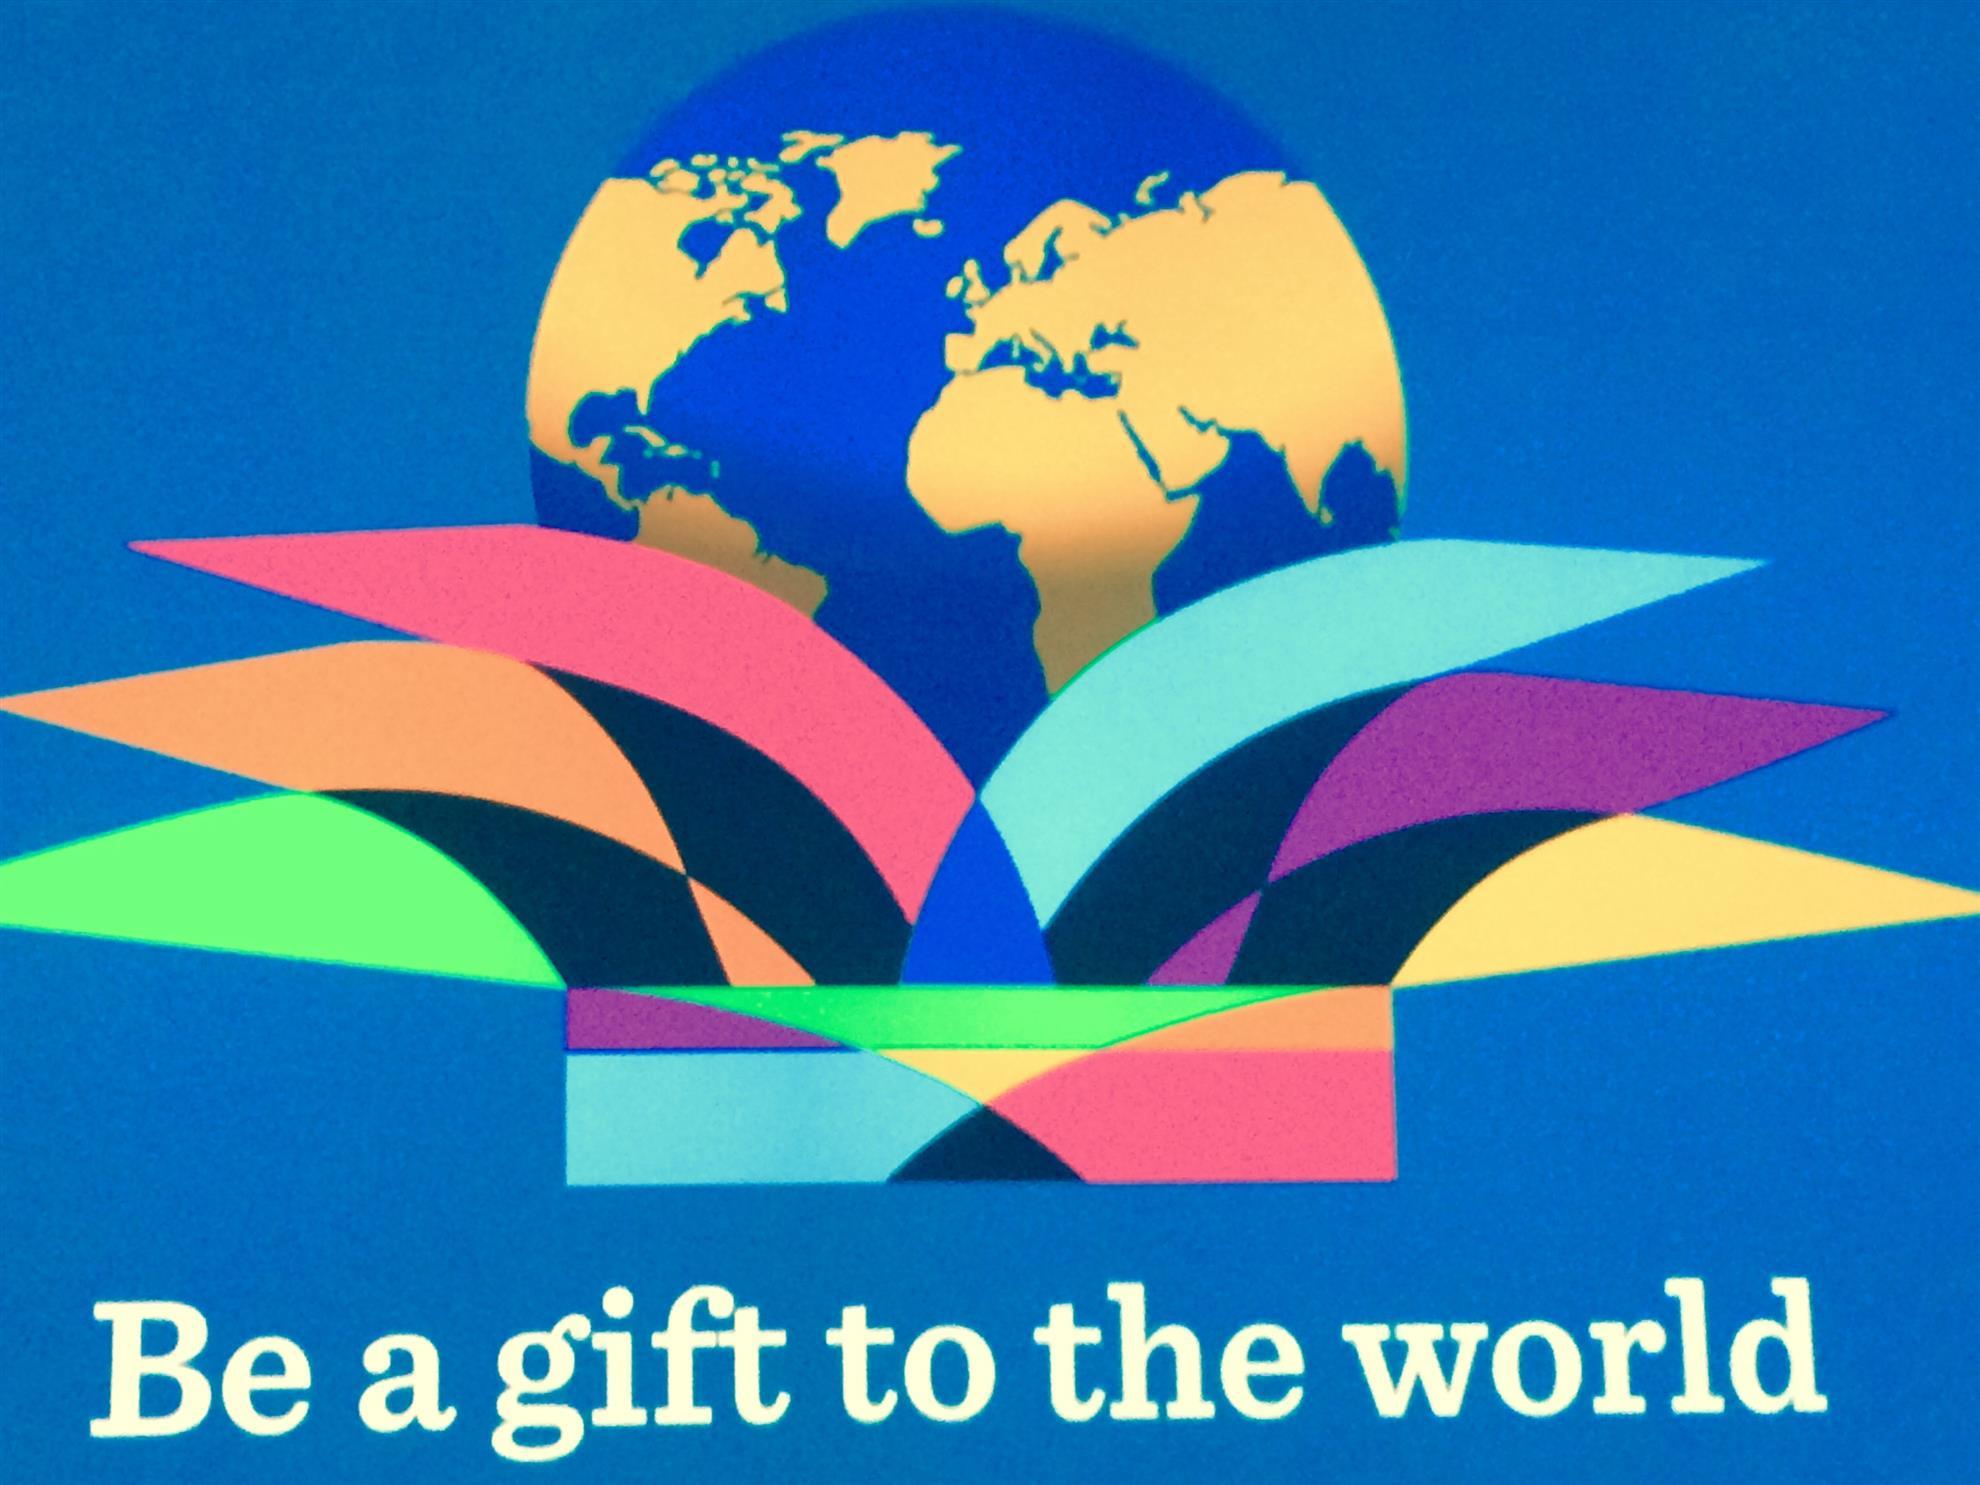 DG Tim Murphy to speak at Aug. 20 Rotary meeting | Rotary club of ...